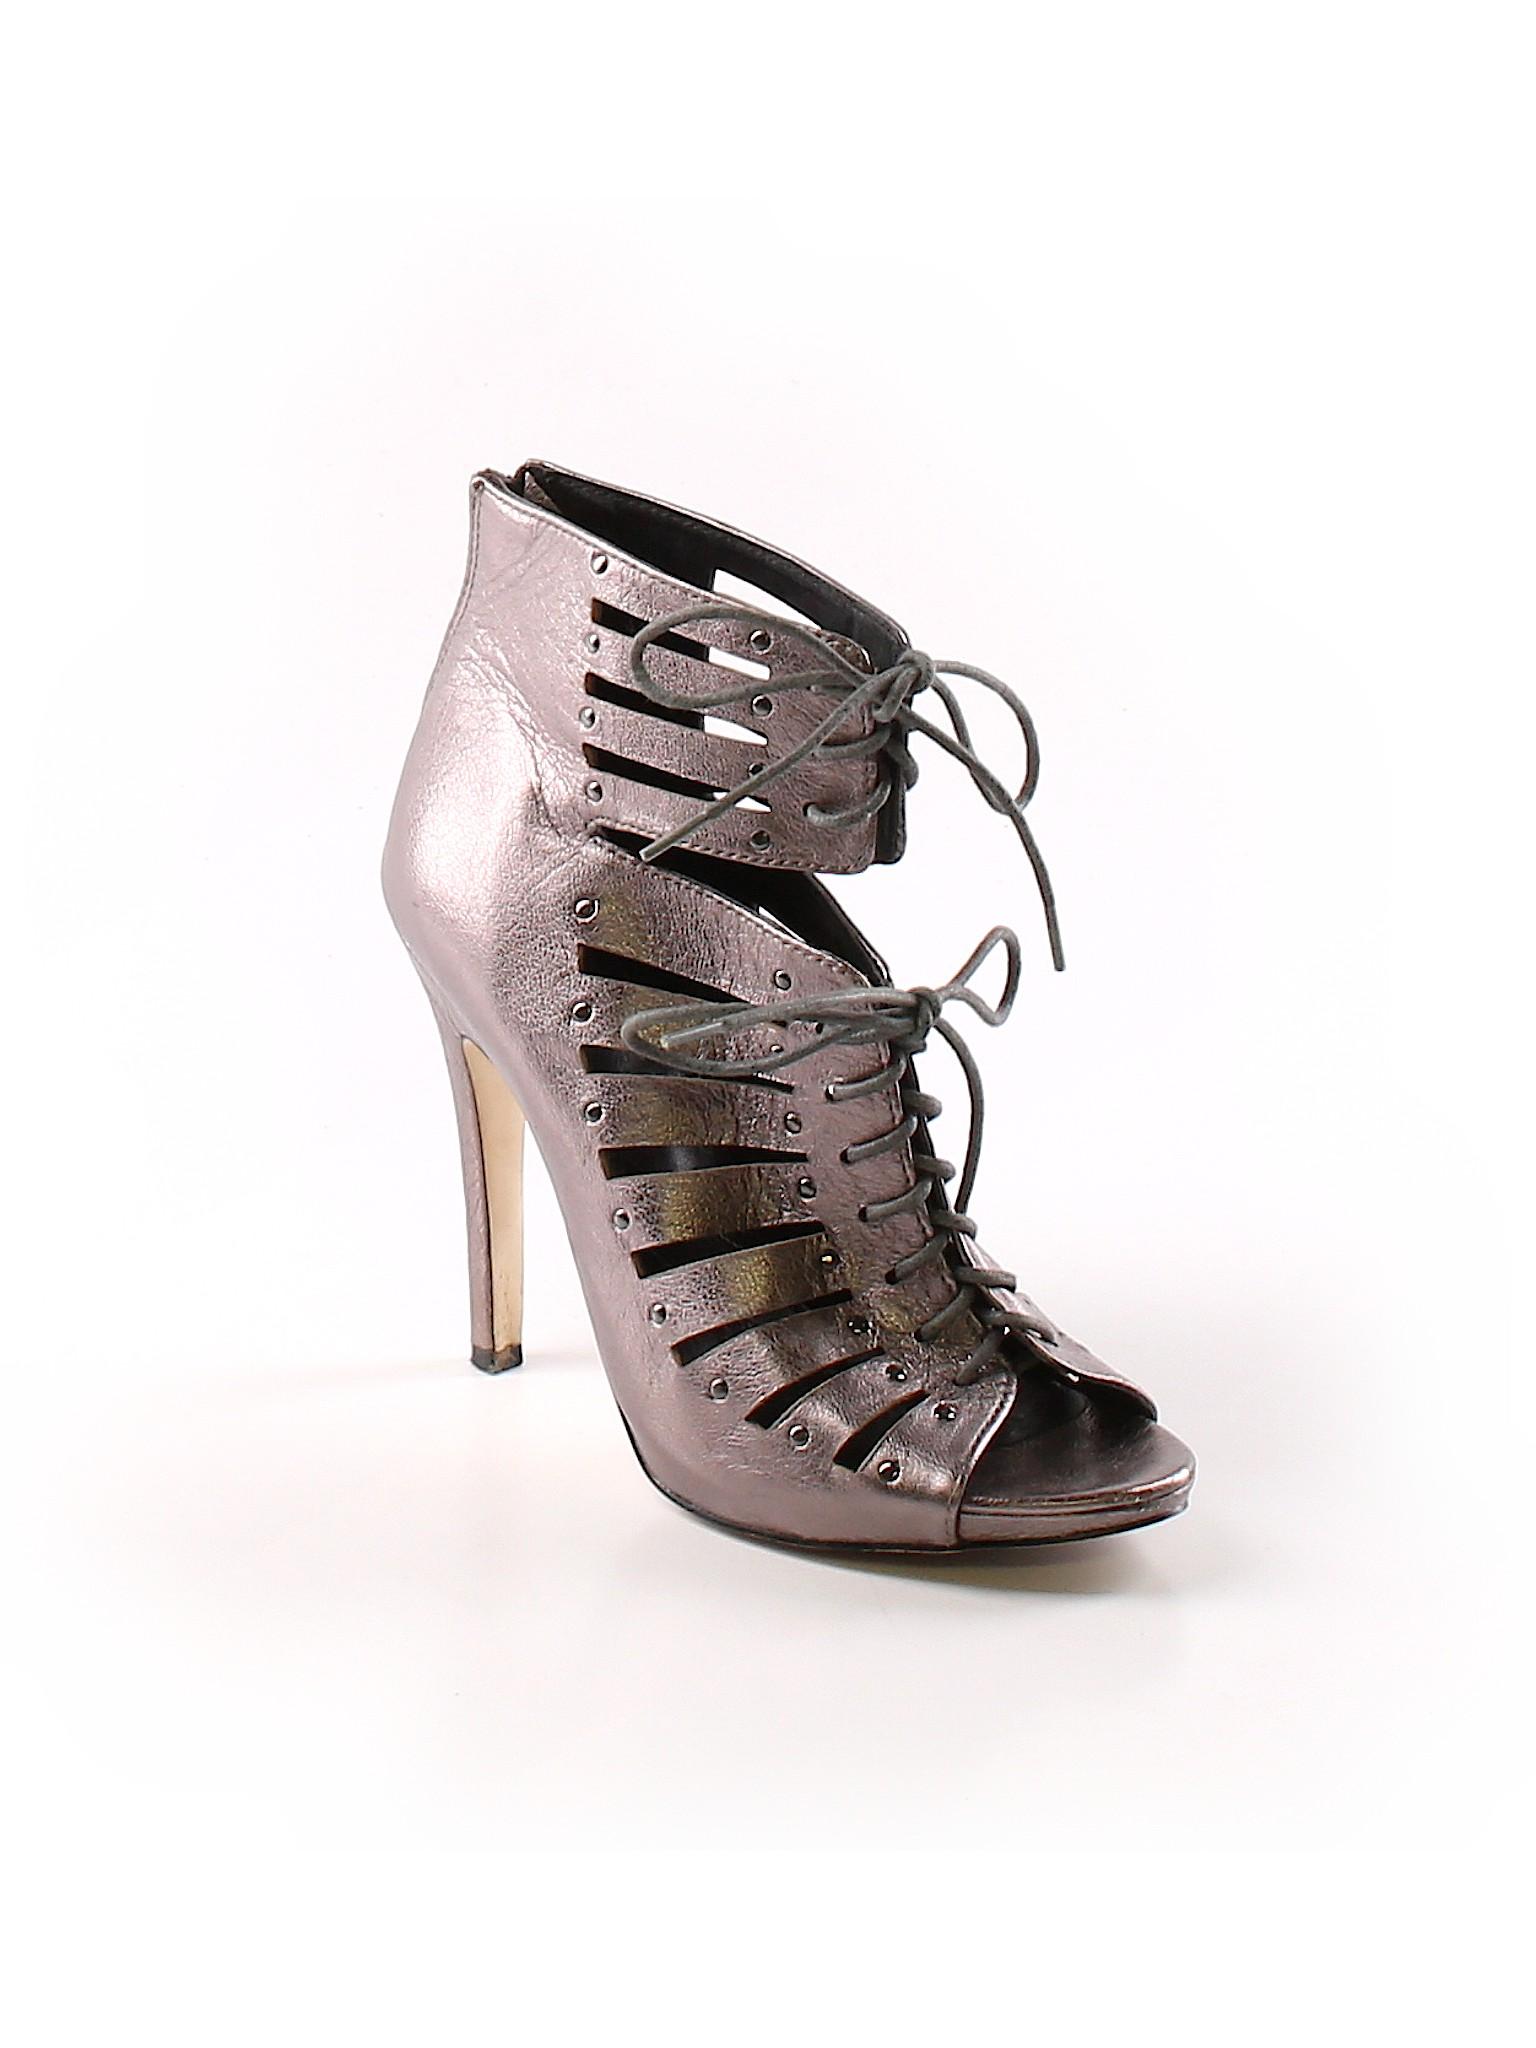 Vita Boutique Dolce DV by Heels promotion UqqI04wA